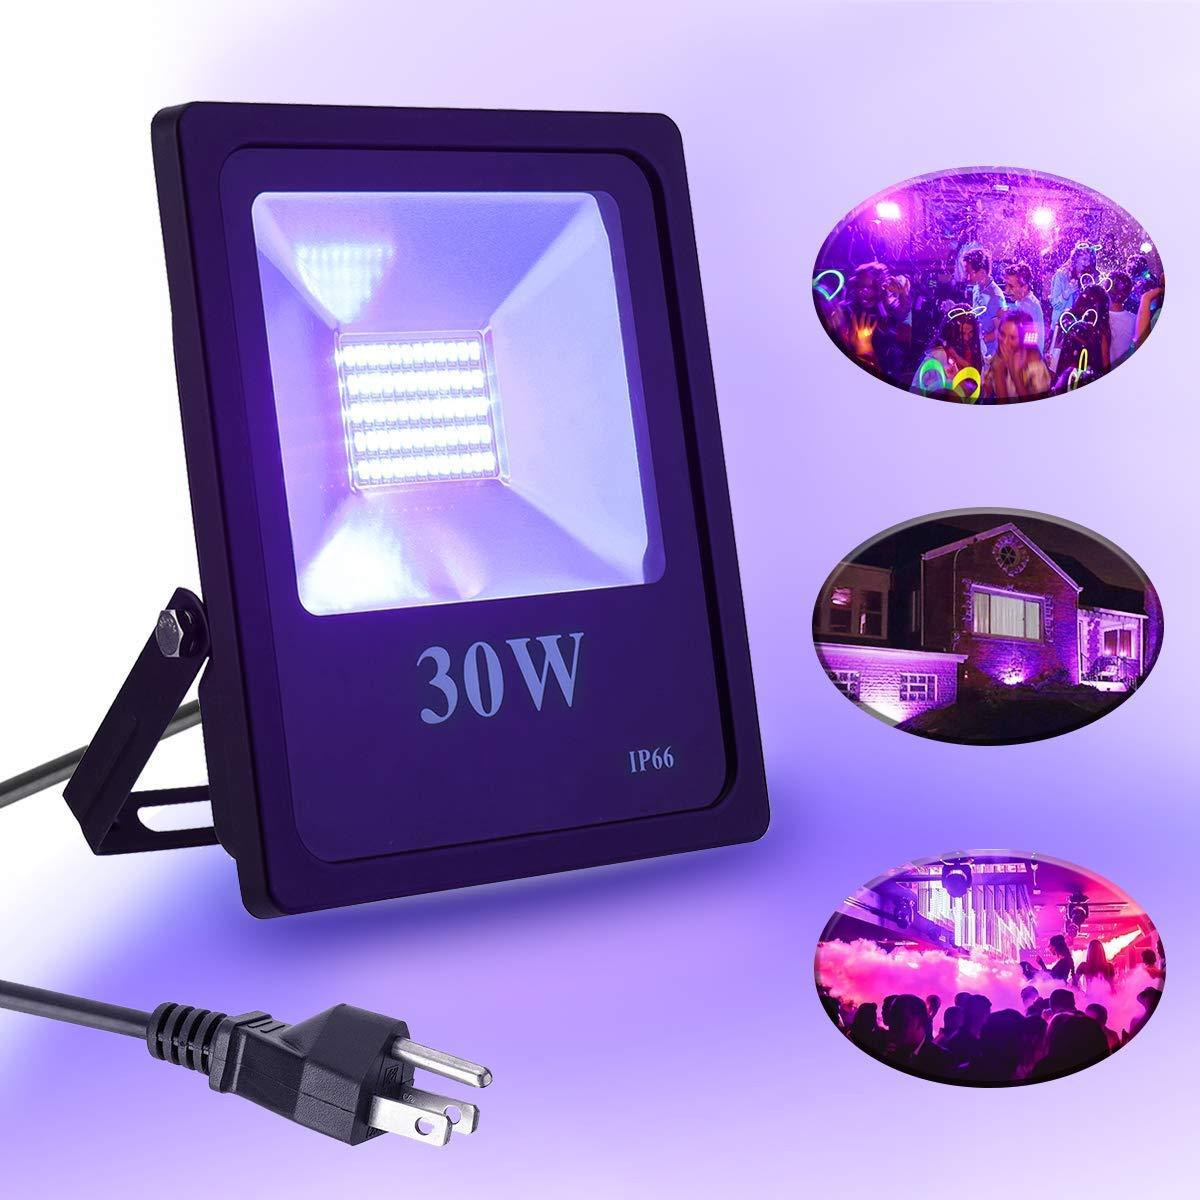 UV Black Light Elfeland UV LED Flood Lights IP66 Waterproof Blacklight 30W Ultra Violet Stage Lighting for Blacklight Party Supplies, Neon Glow, Body Paint, Fluorescent Poster (85V-265V AC) ELFELANDhoasupic1189